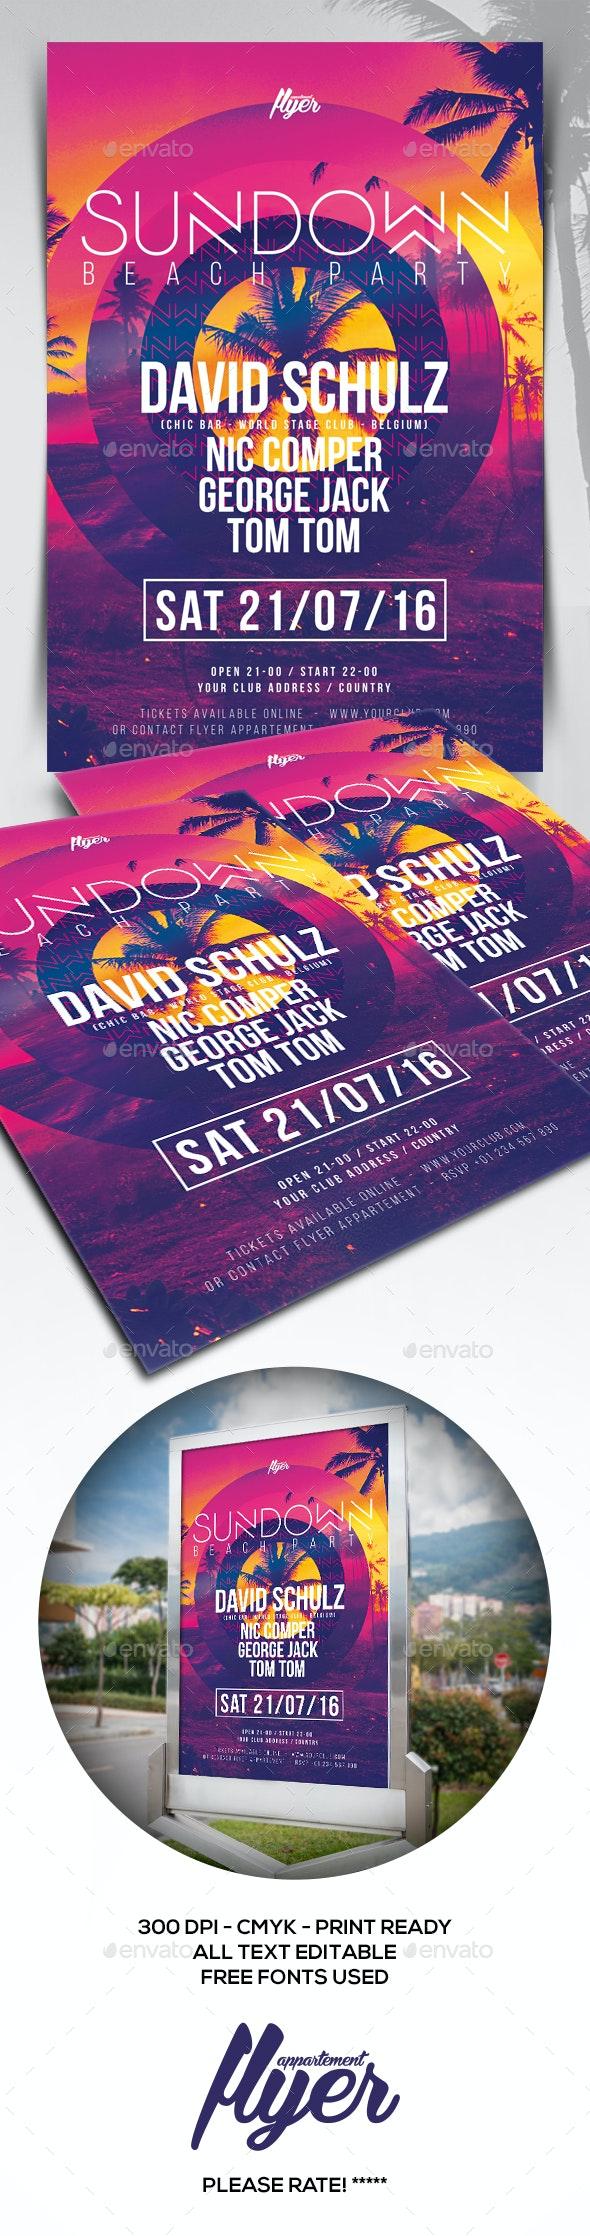 Sundown Beach Party Flyer - Clubs & Parties Events